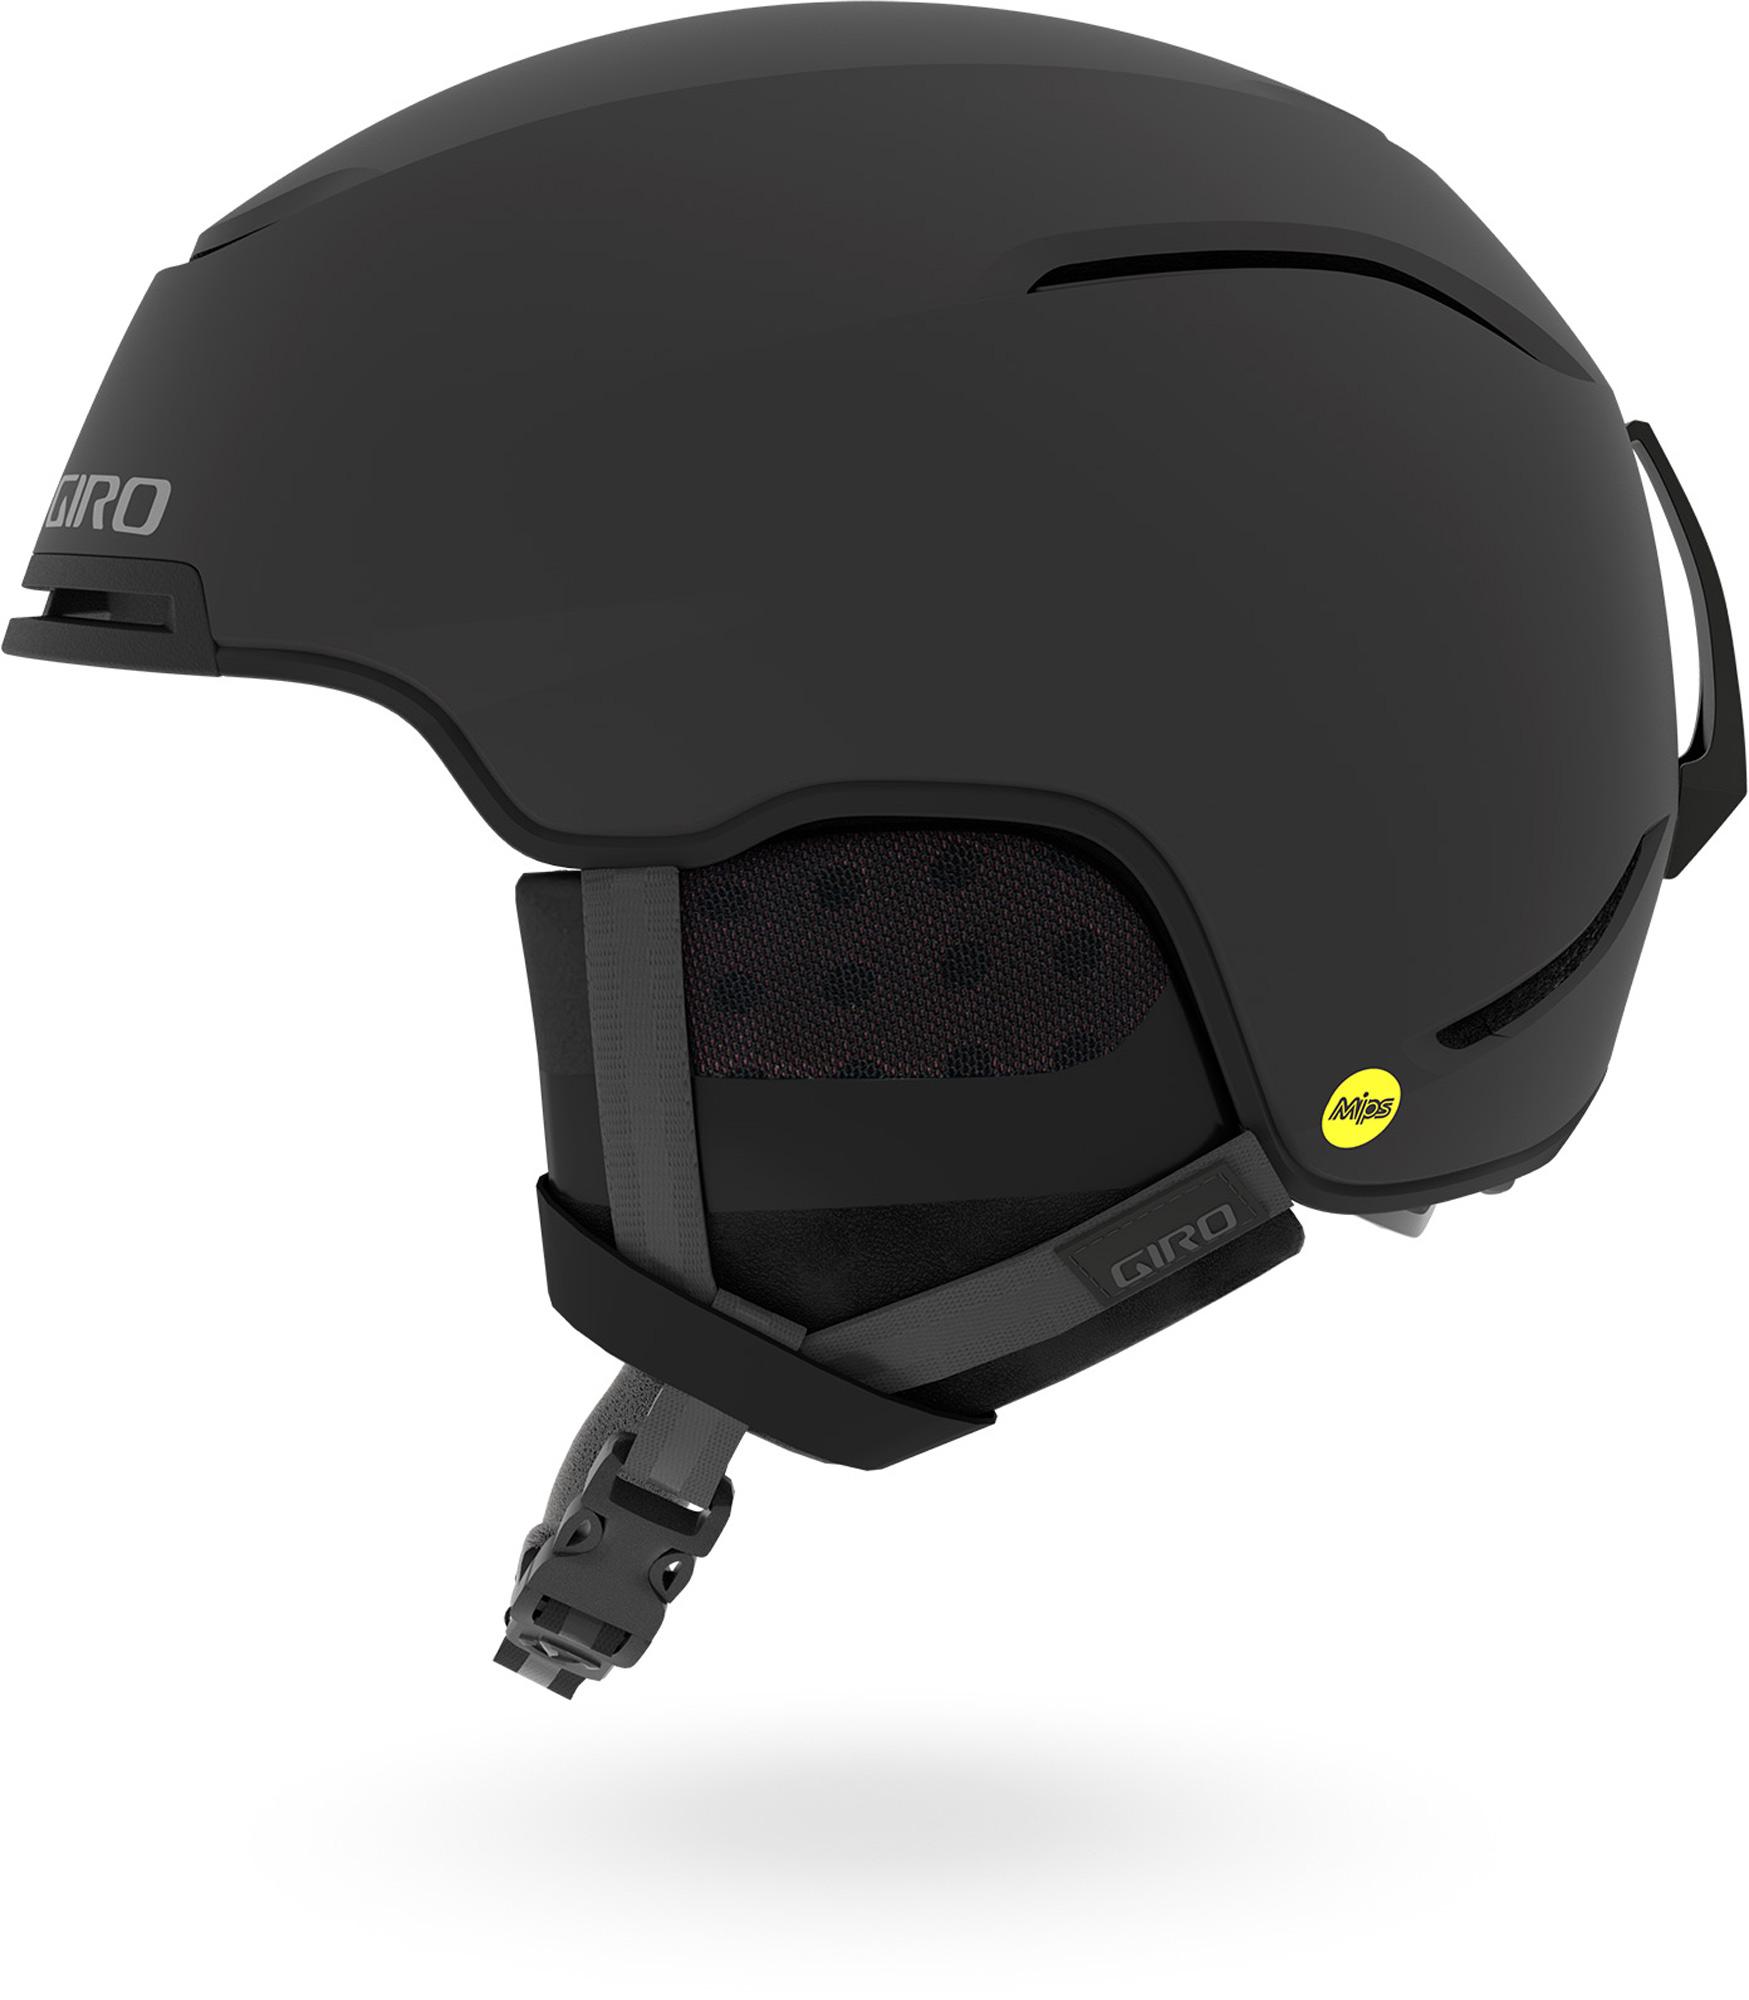 8994c257e83 Giro Terra MIPS Helmet